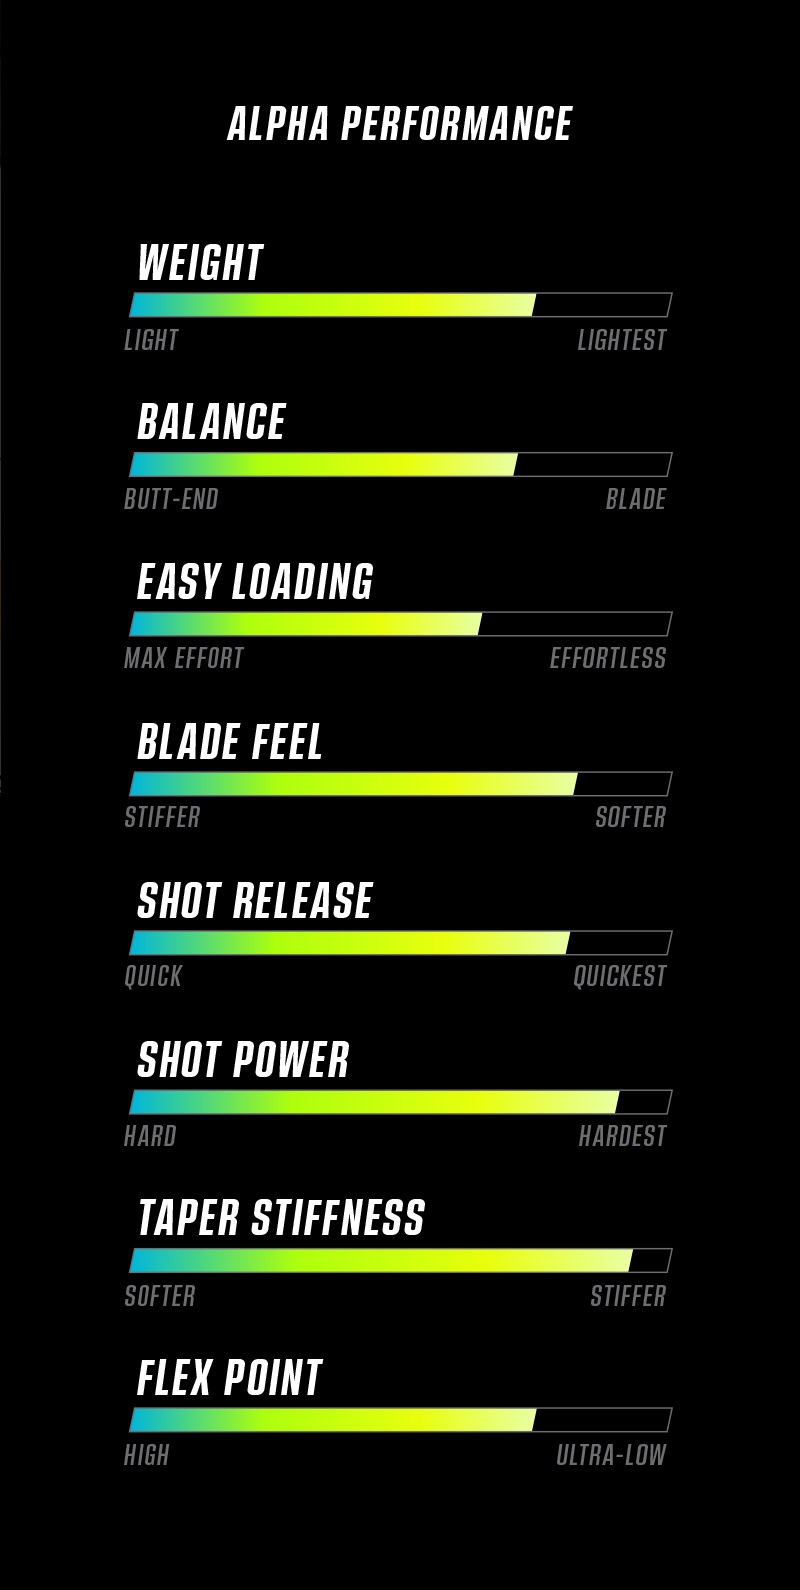 Alpha Performance